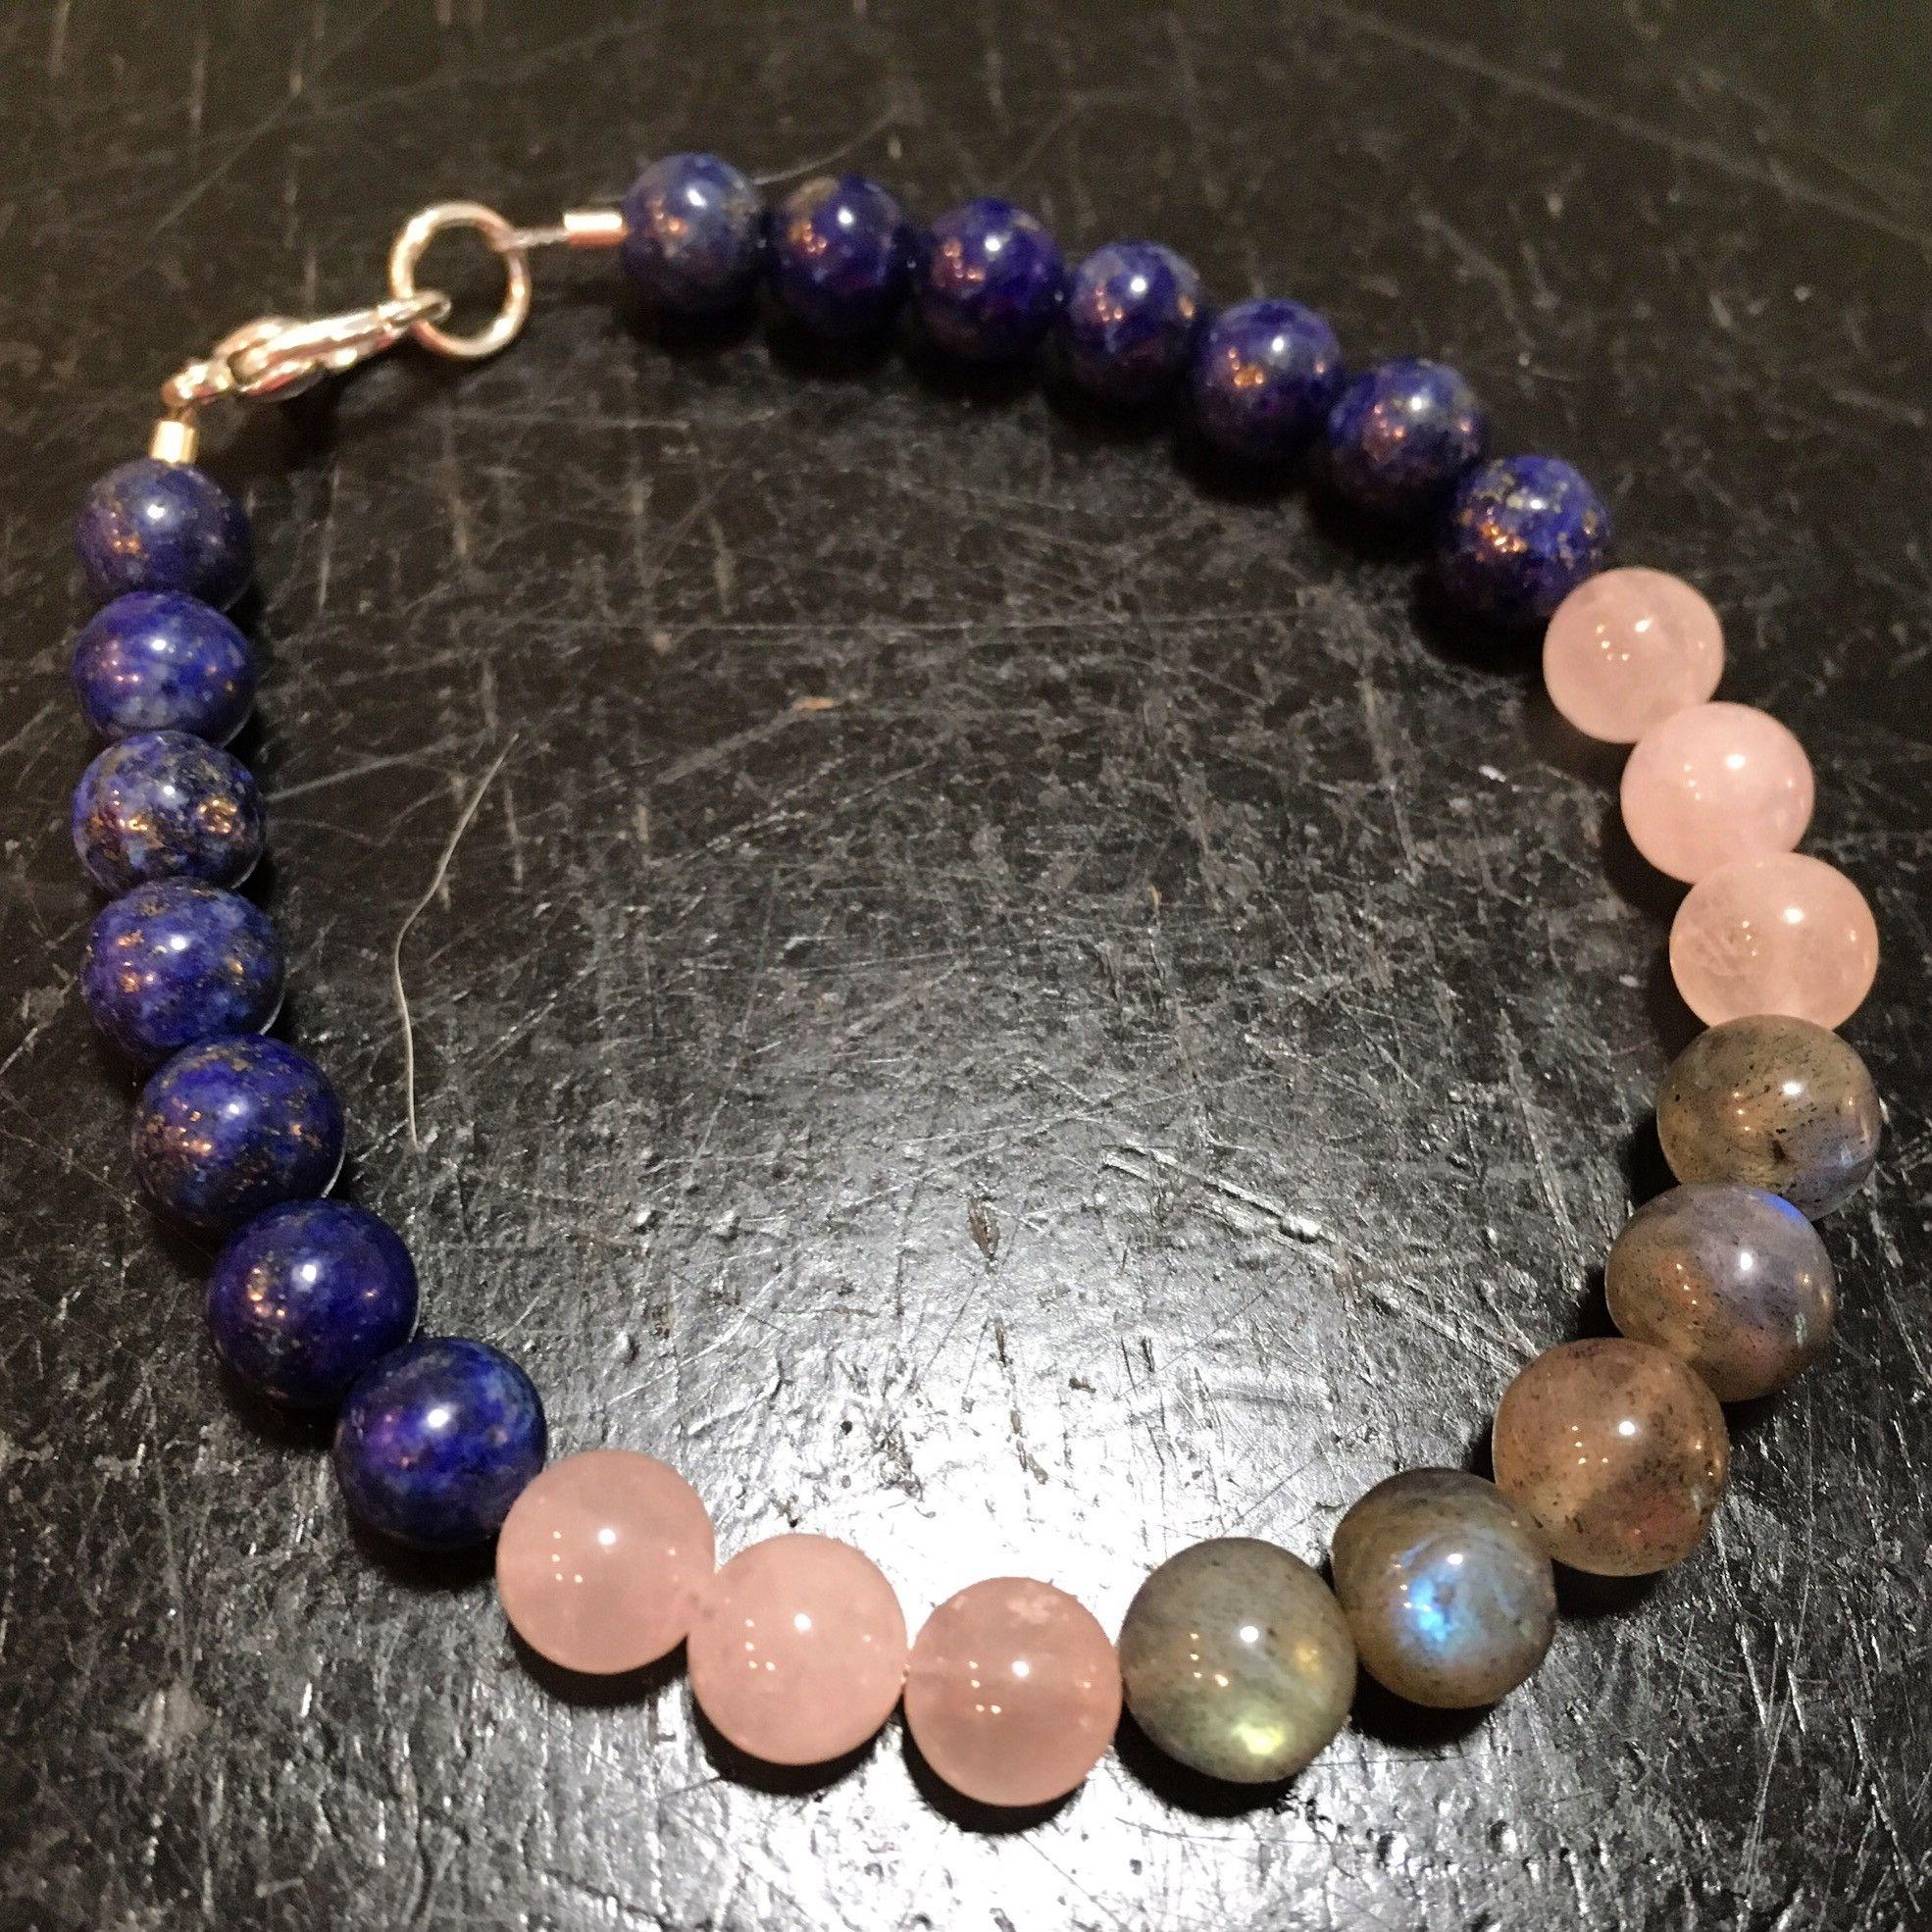 db61d4ae32c667 Inner Strength and Power Bracelet (Rose Quartz, Labradorite, & Lapis Lazuli)